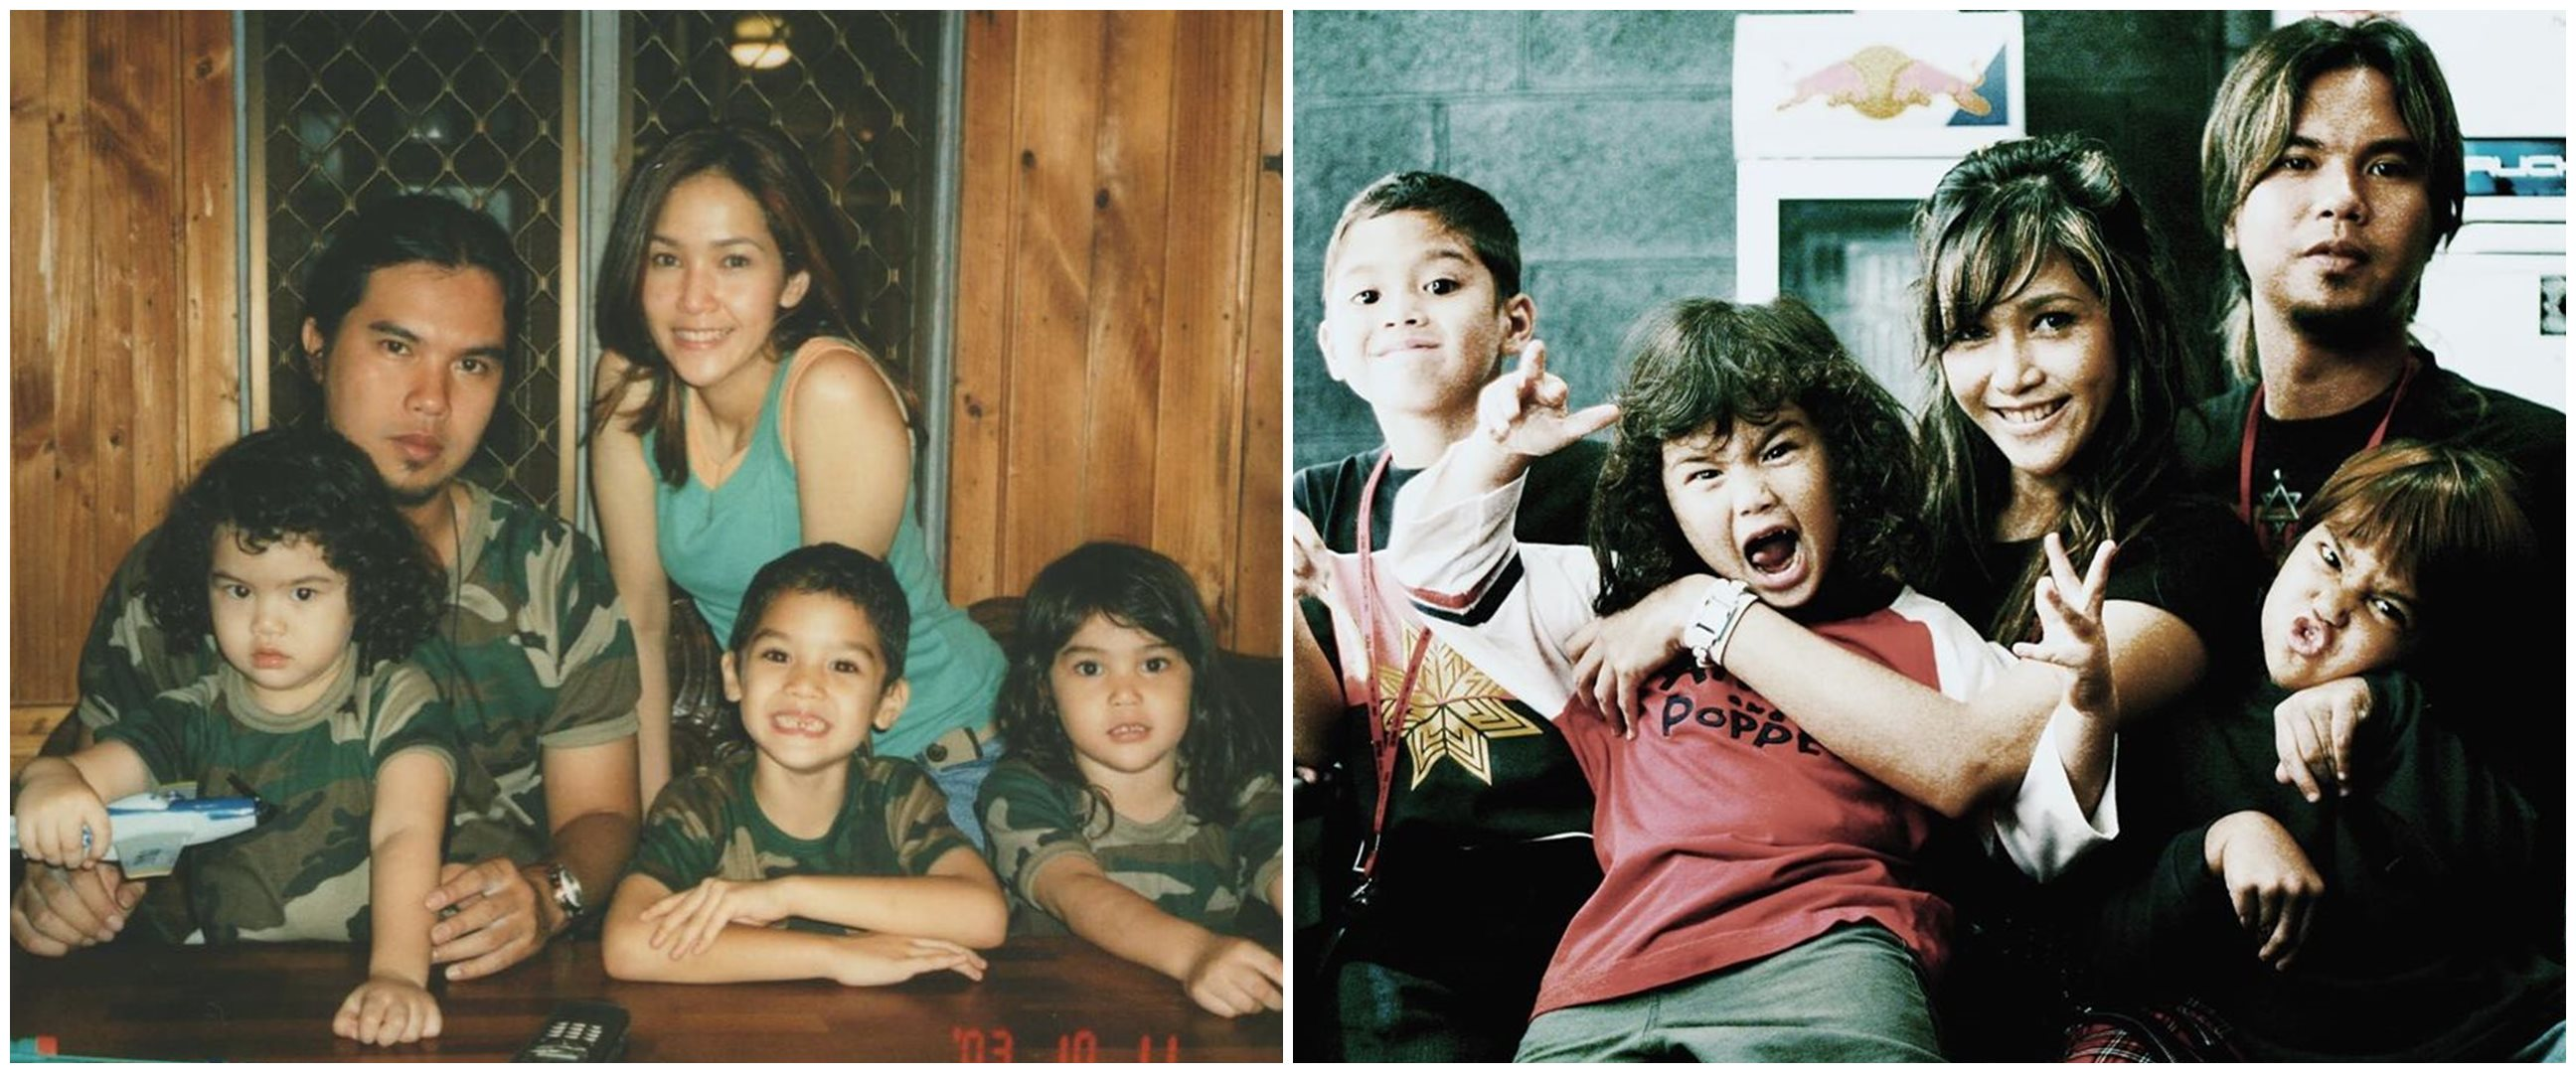 6 Foto kenangan masa kecil Al, El, dan Dul bareng orangtuanya